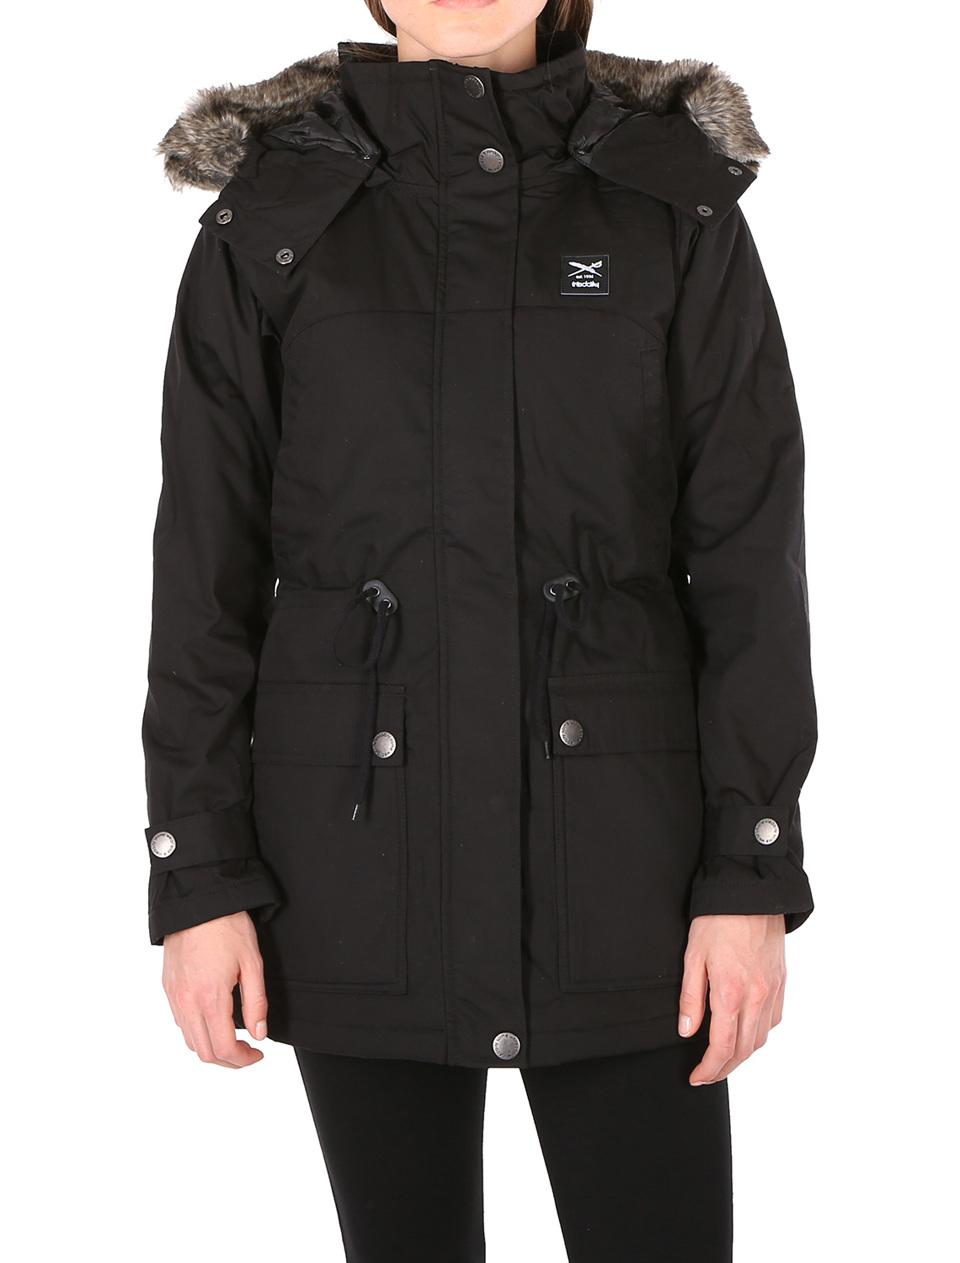 Koerte Jacket [black] | shop official IRIEDAILY